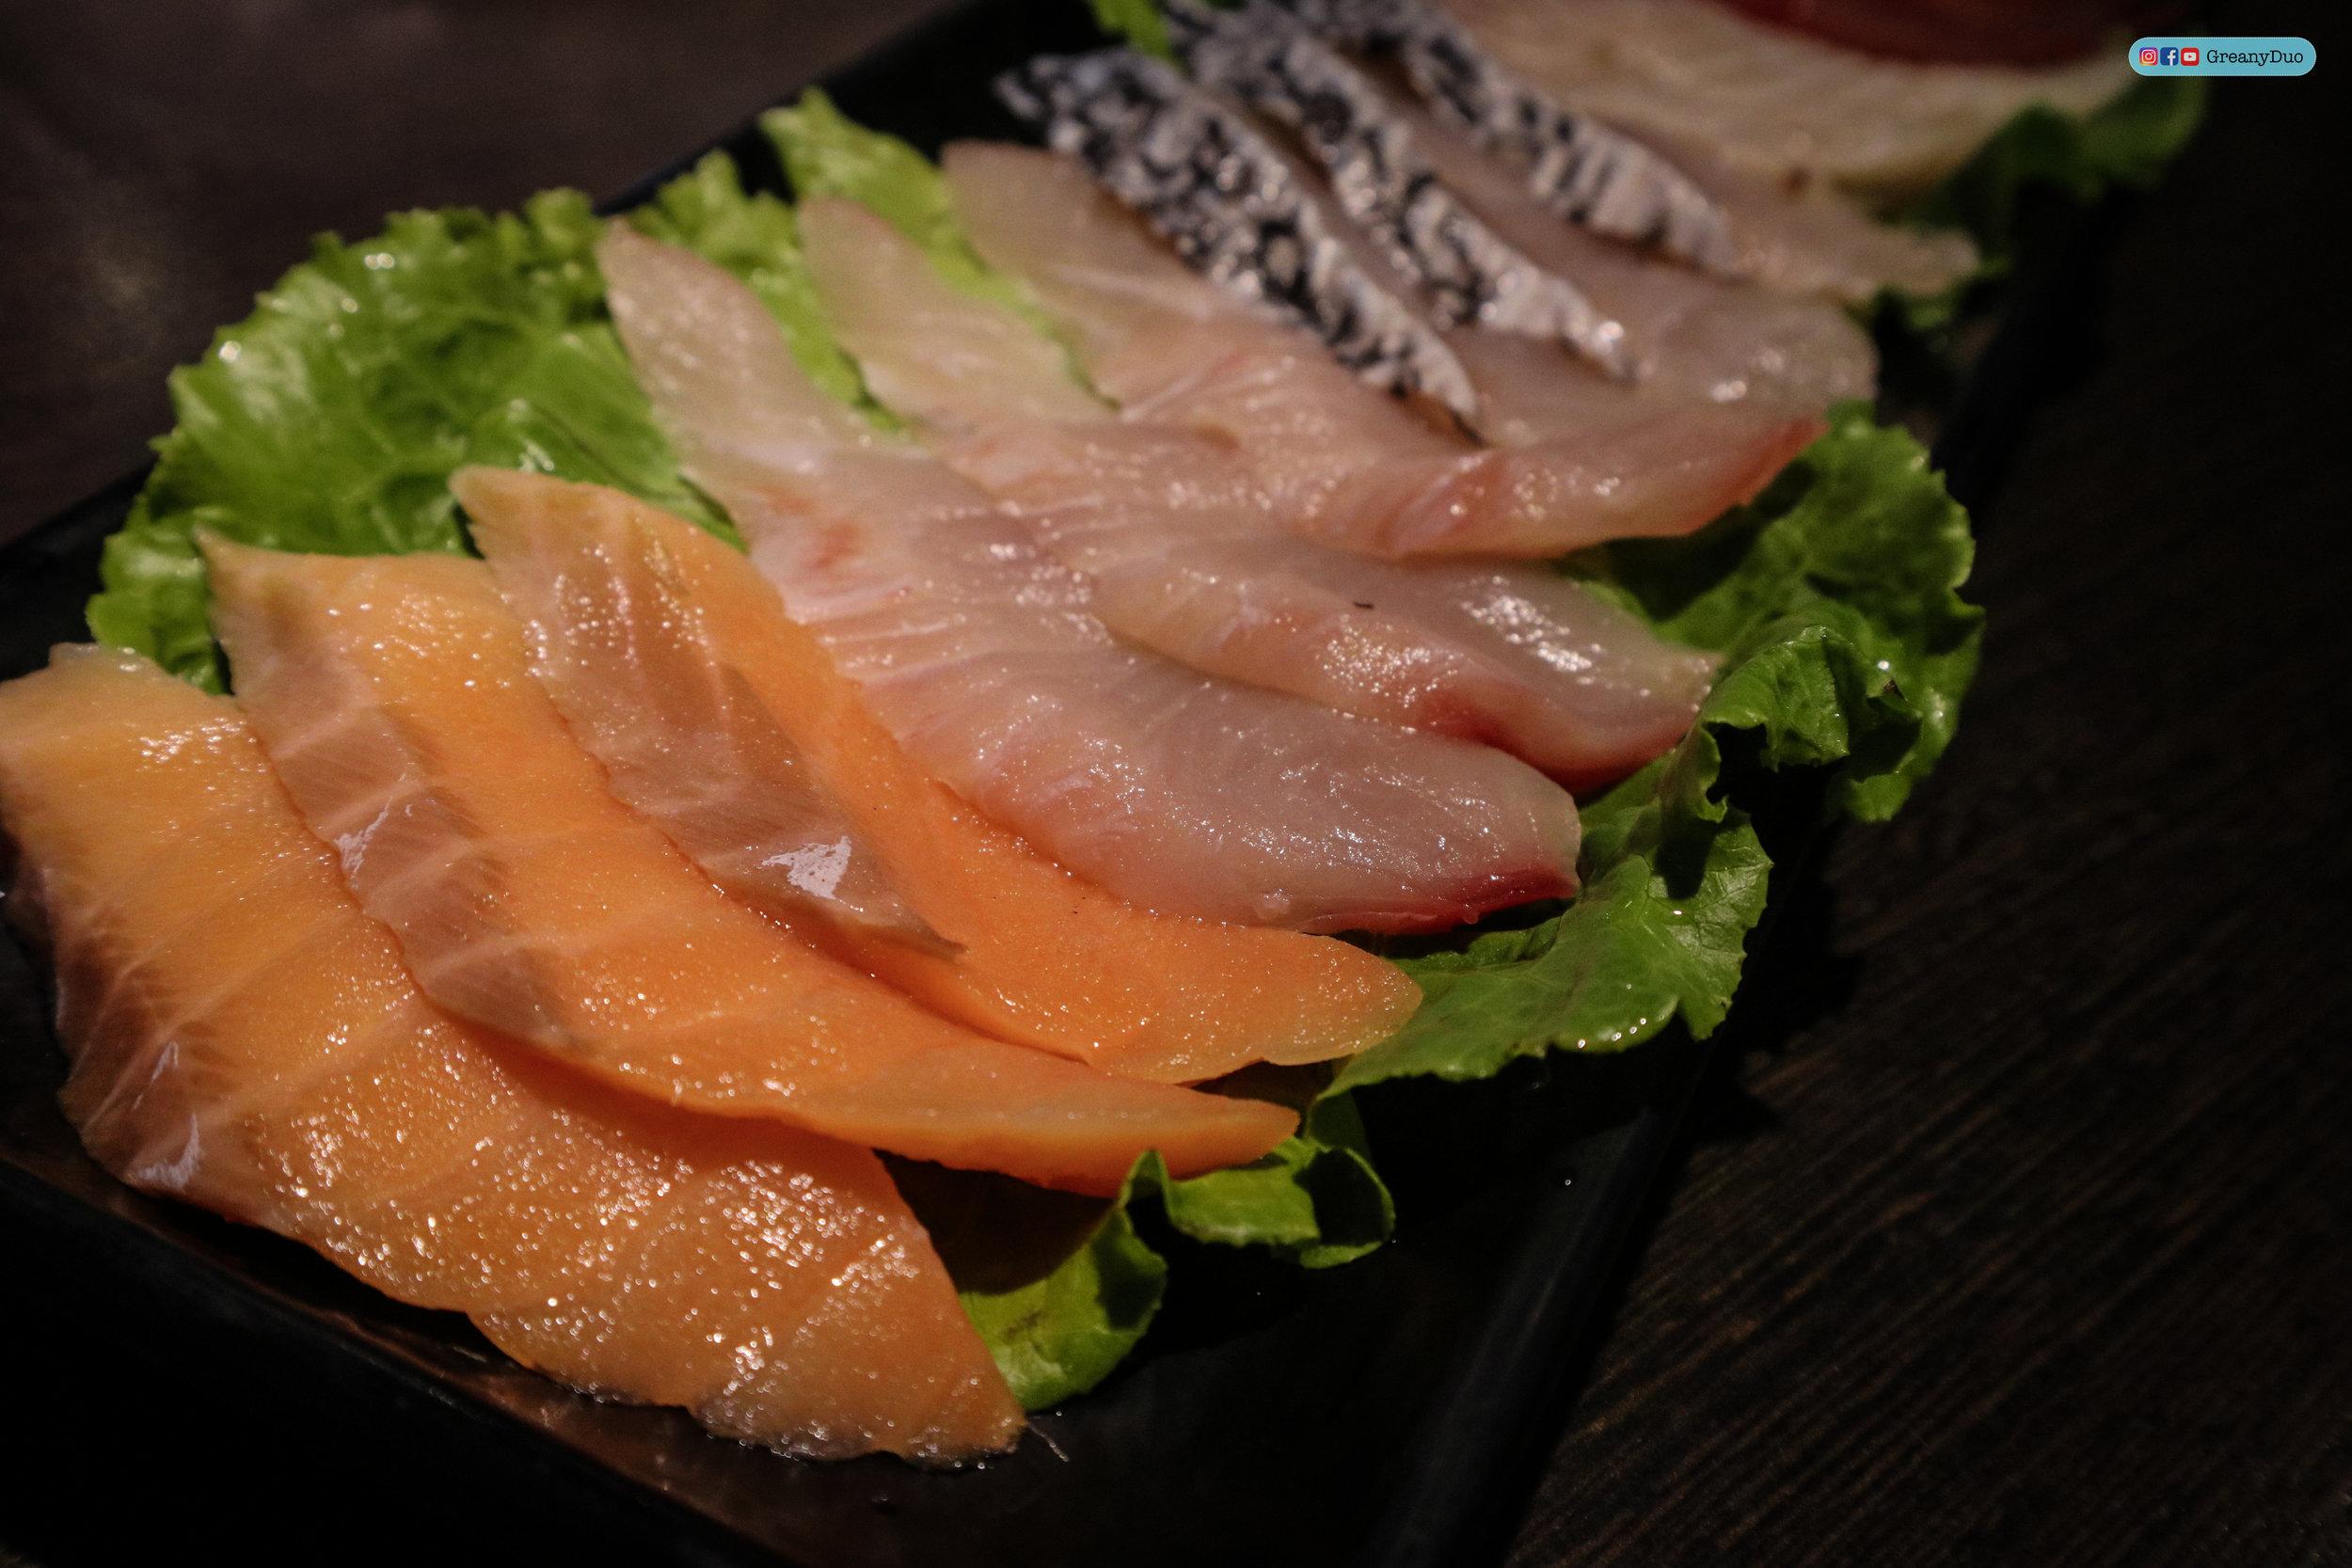 fresh fishs at บุฟเฟ่ต์ชาบูไต้หวันที่ Hakkai Shabu Shabu ซีเหมินติง